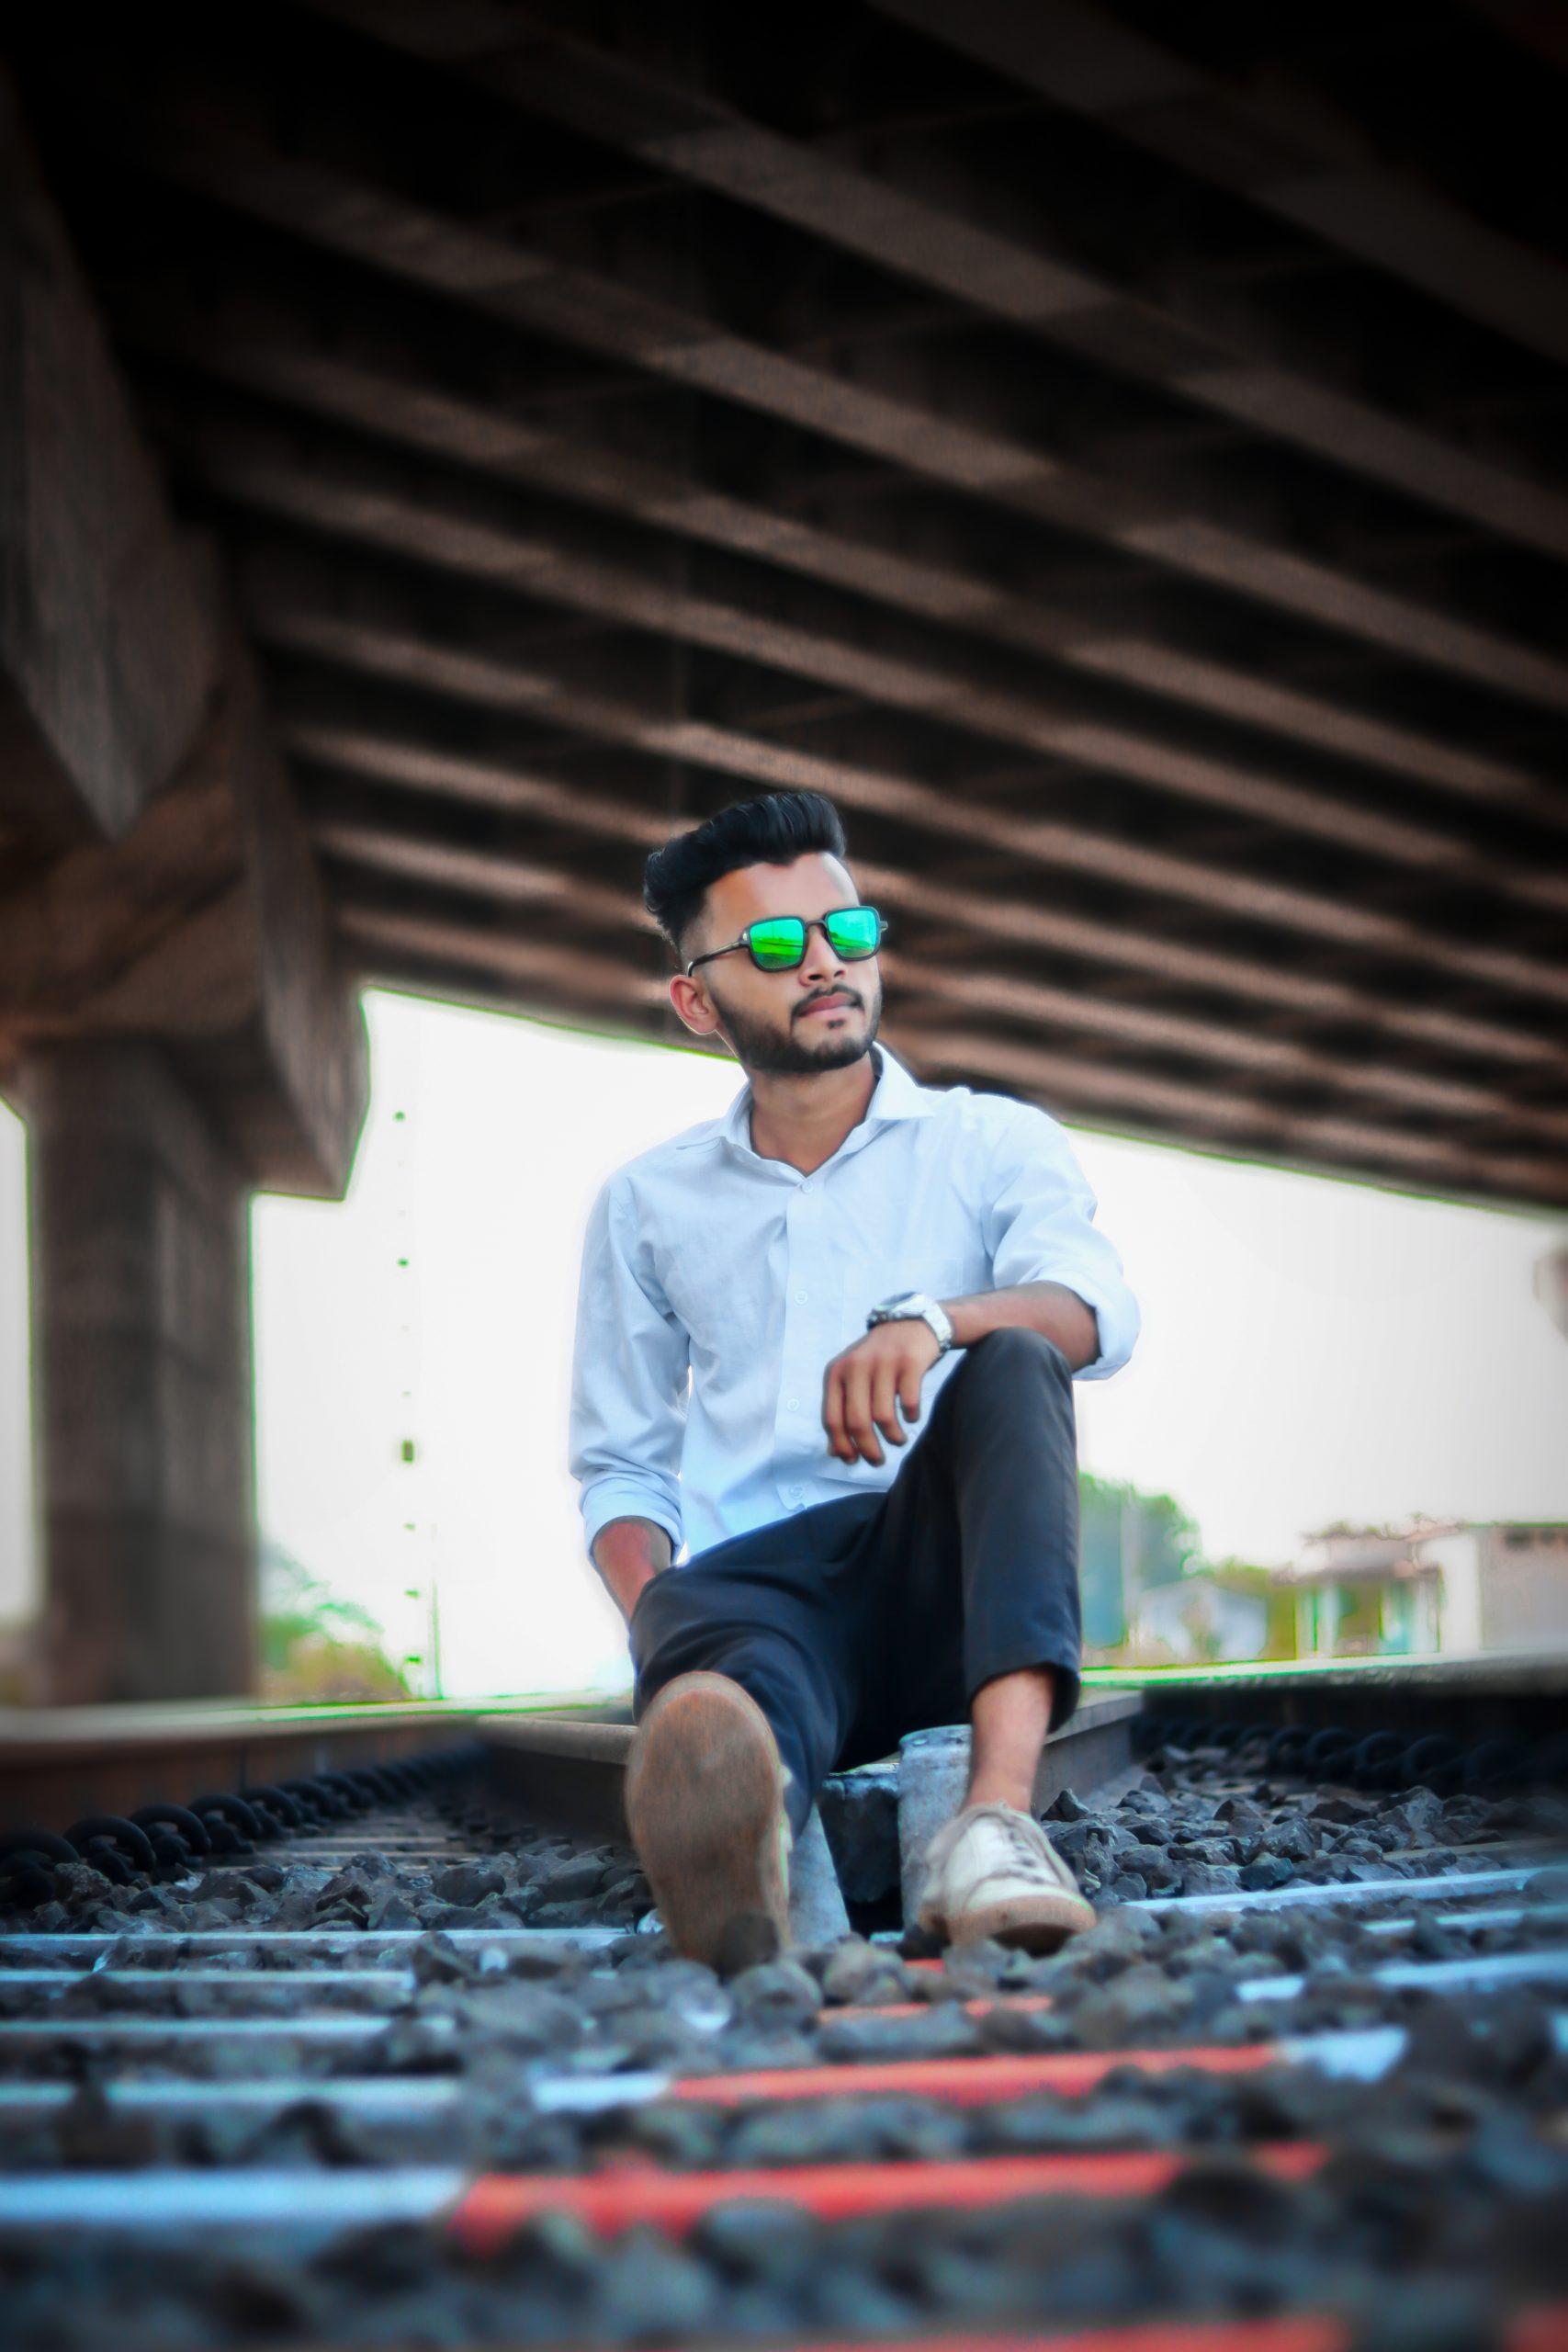 A male model sitting on railway track